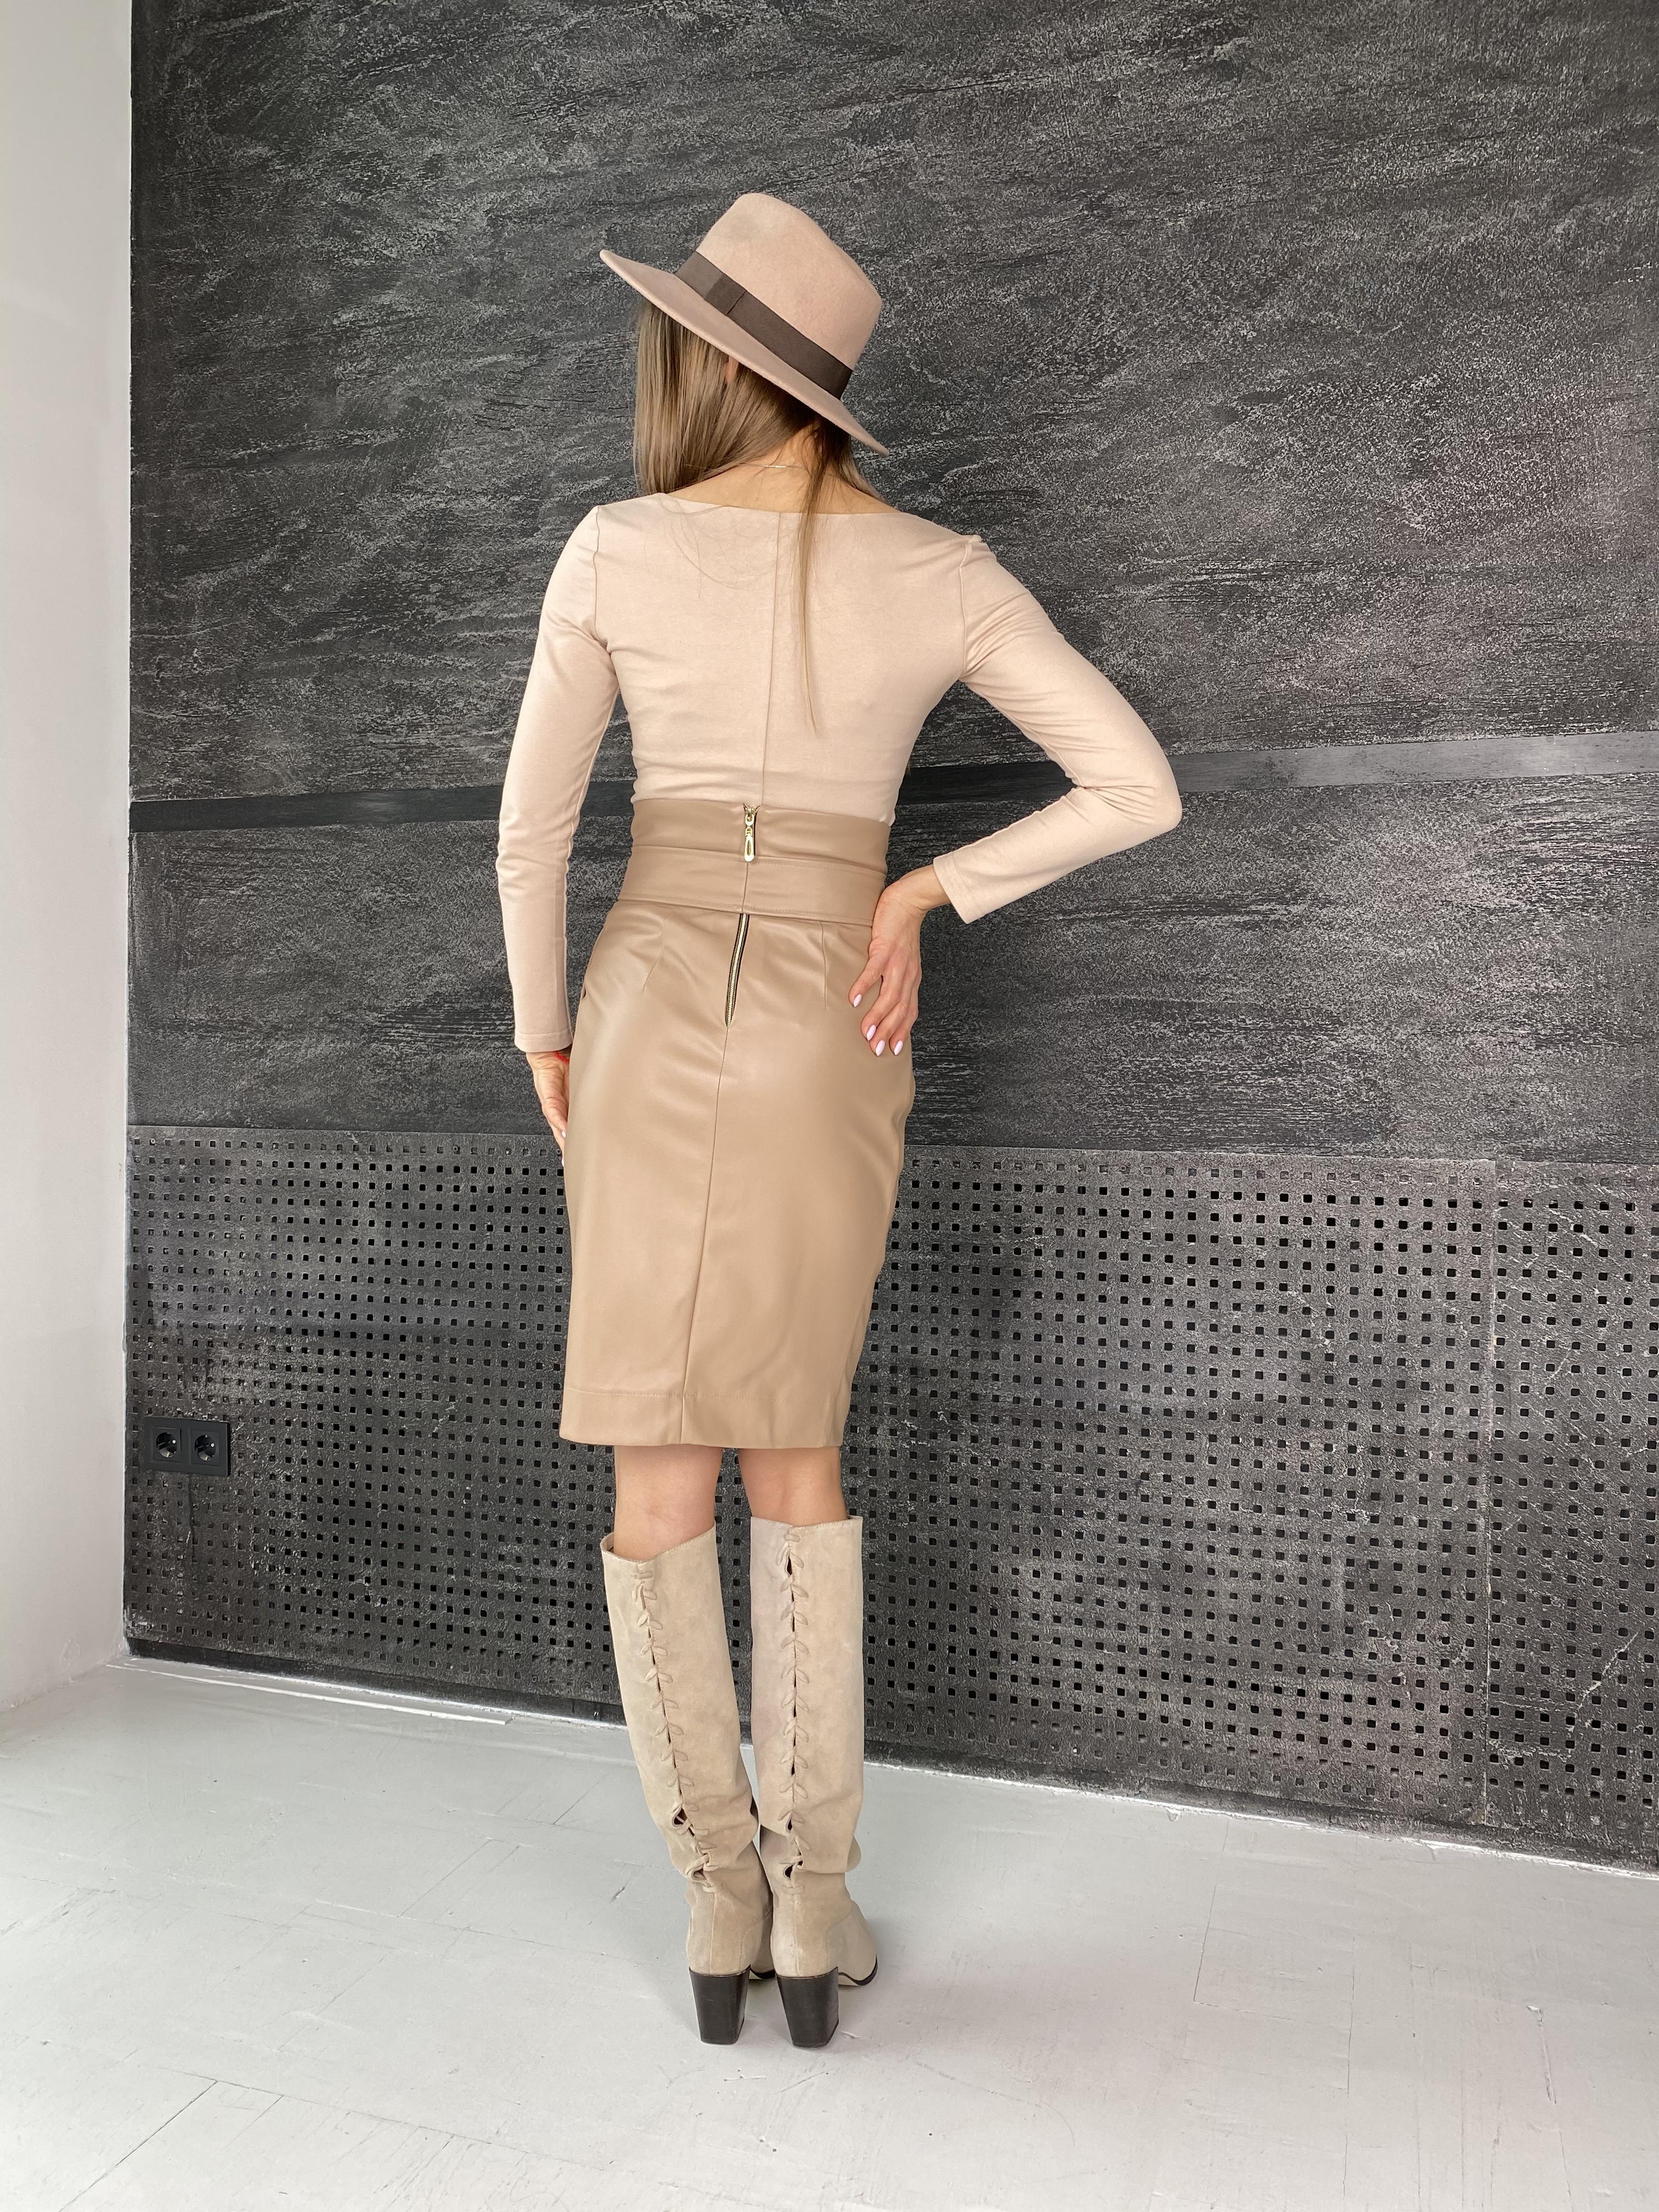 Марси юбка из экокожи 7913 АРТ. 46105 Цвет: Бежевый - фото 5, интернет магазин tm-modus.ru